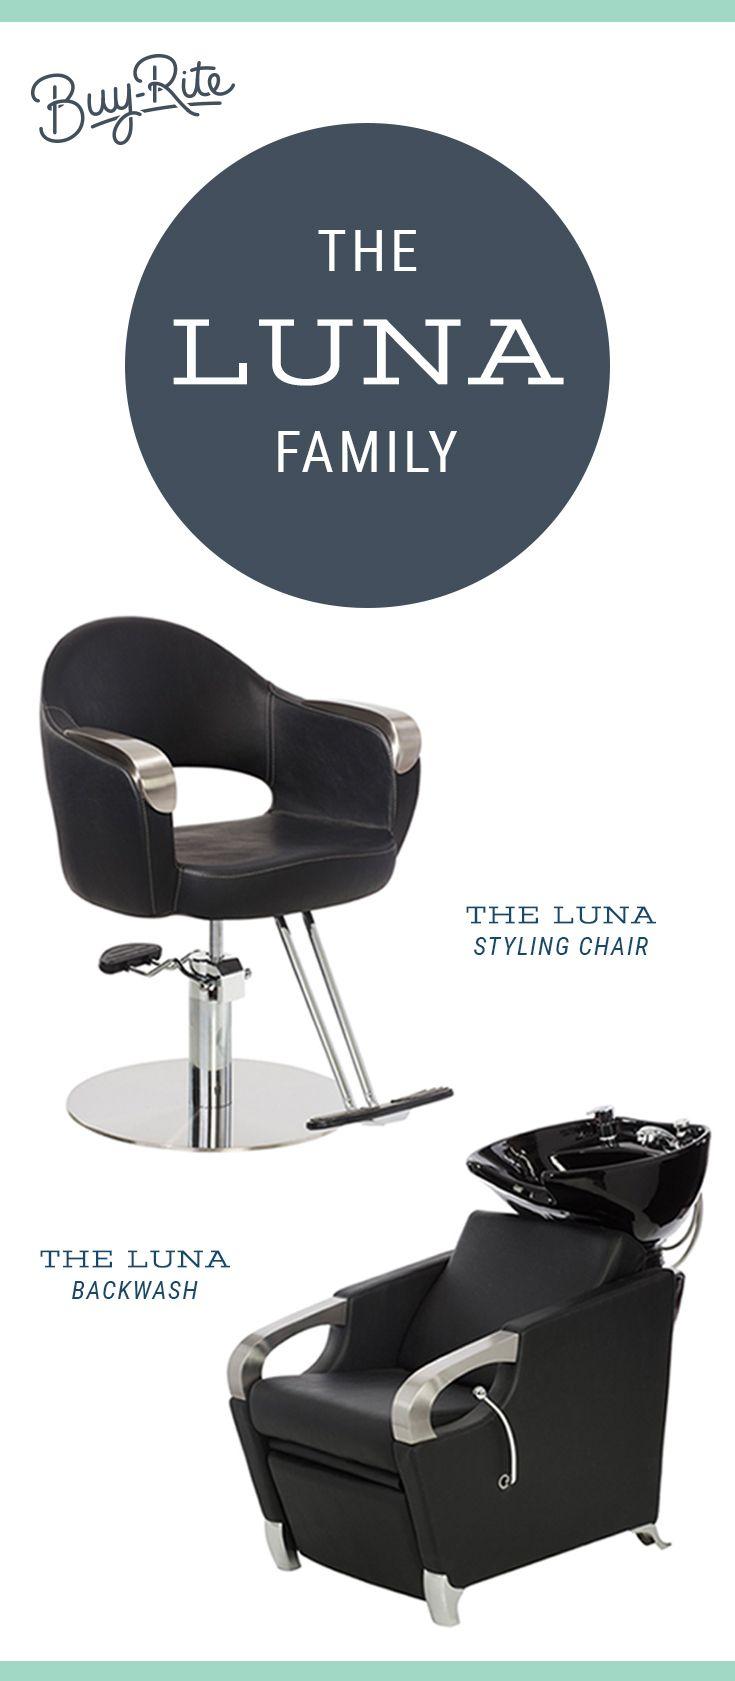 meet the luna family buy rite beauty salon equipment salon rh pinterest com